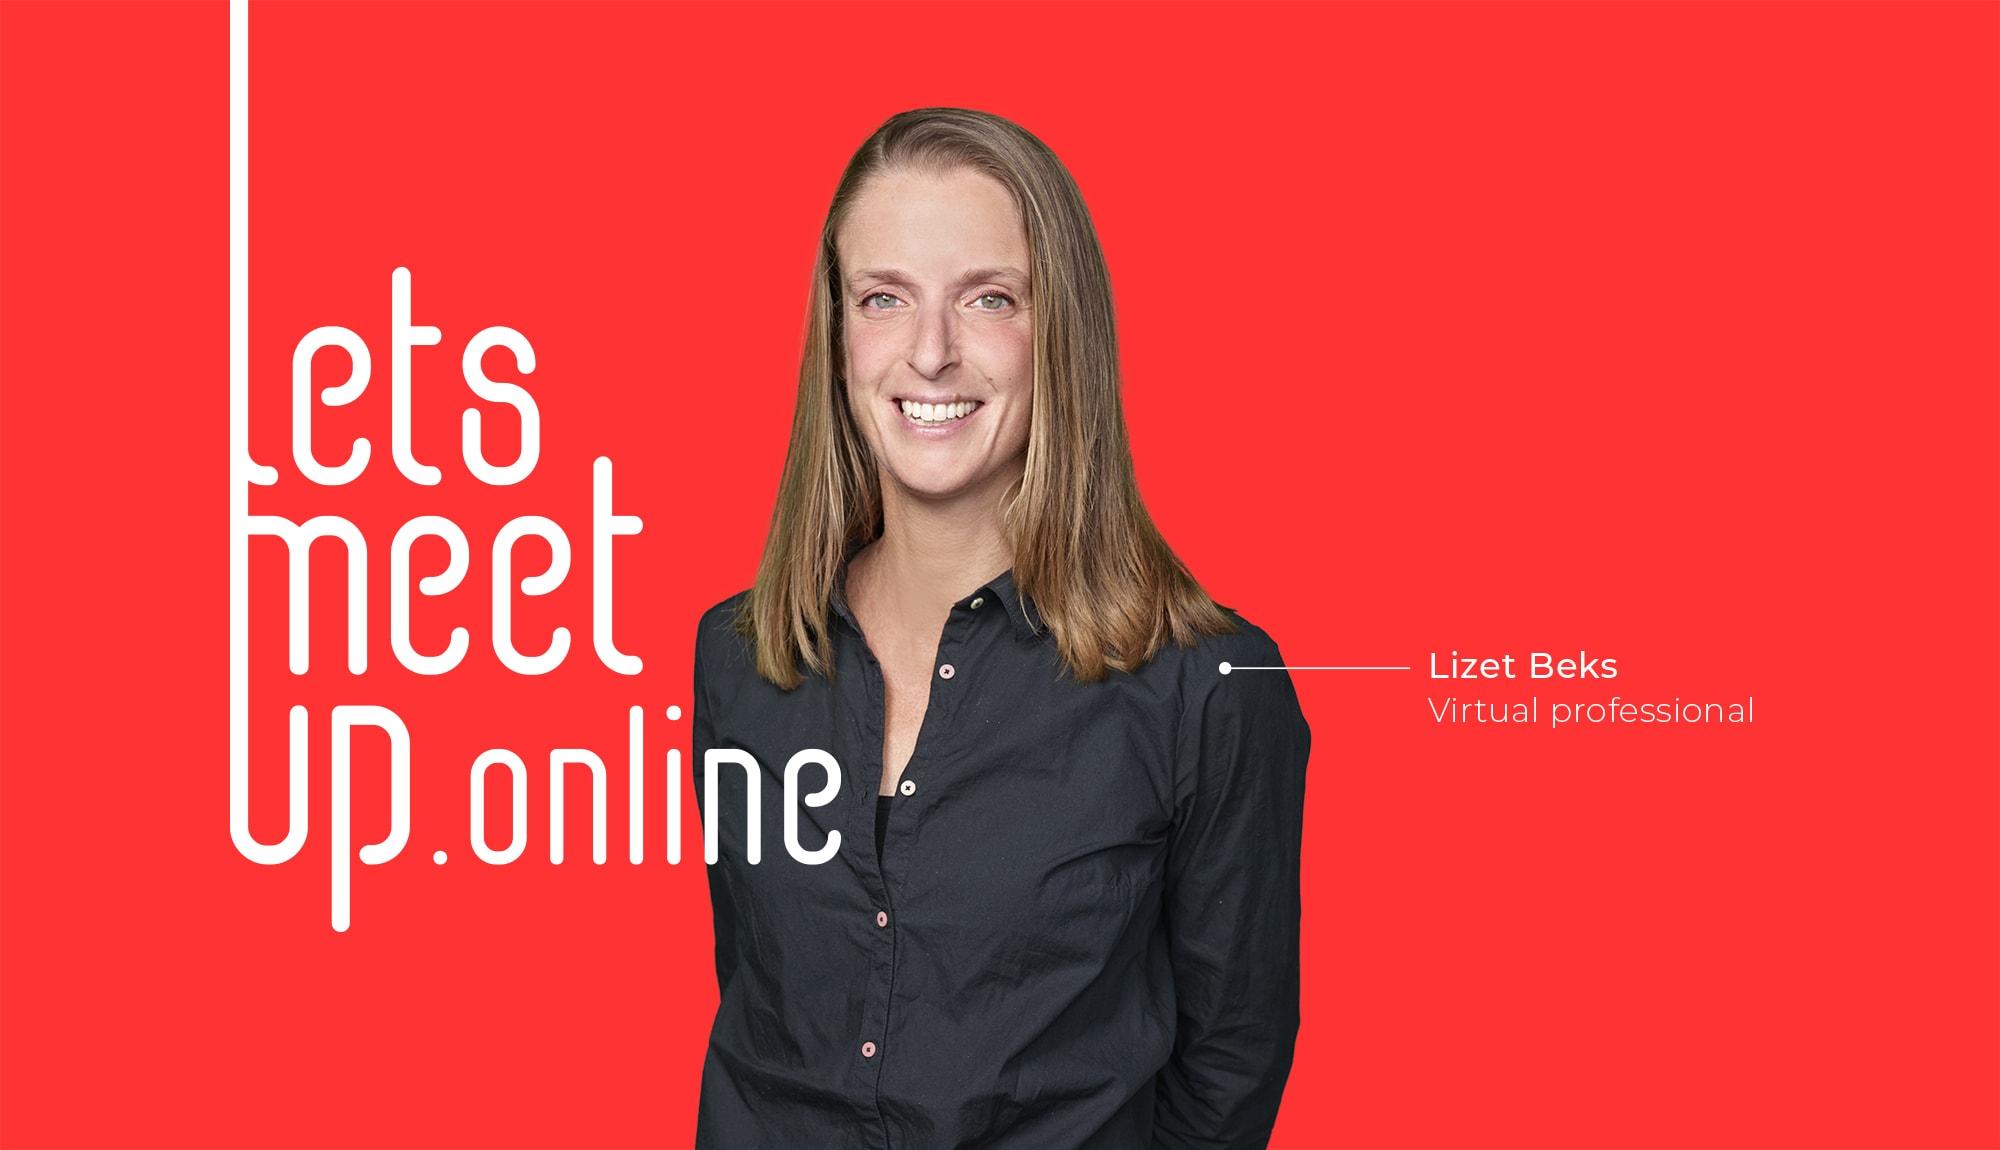 Virtual professional, freelance projectmanager